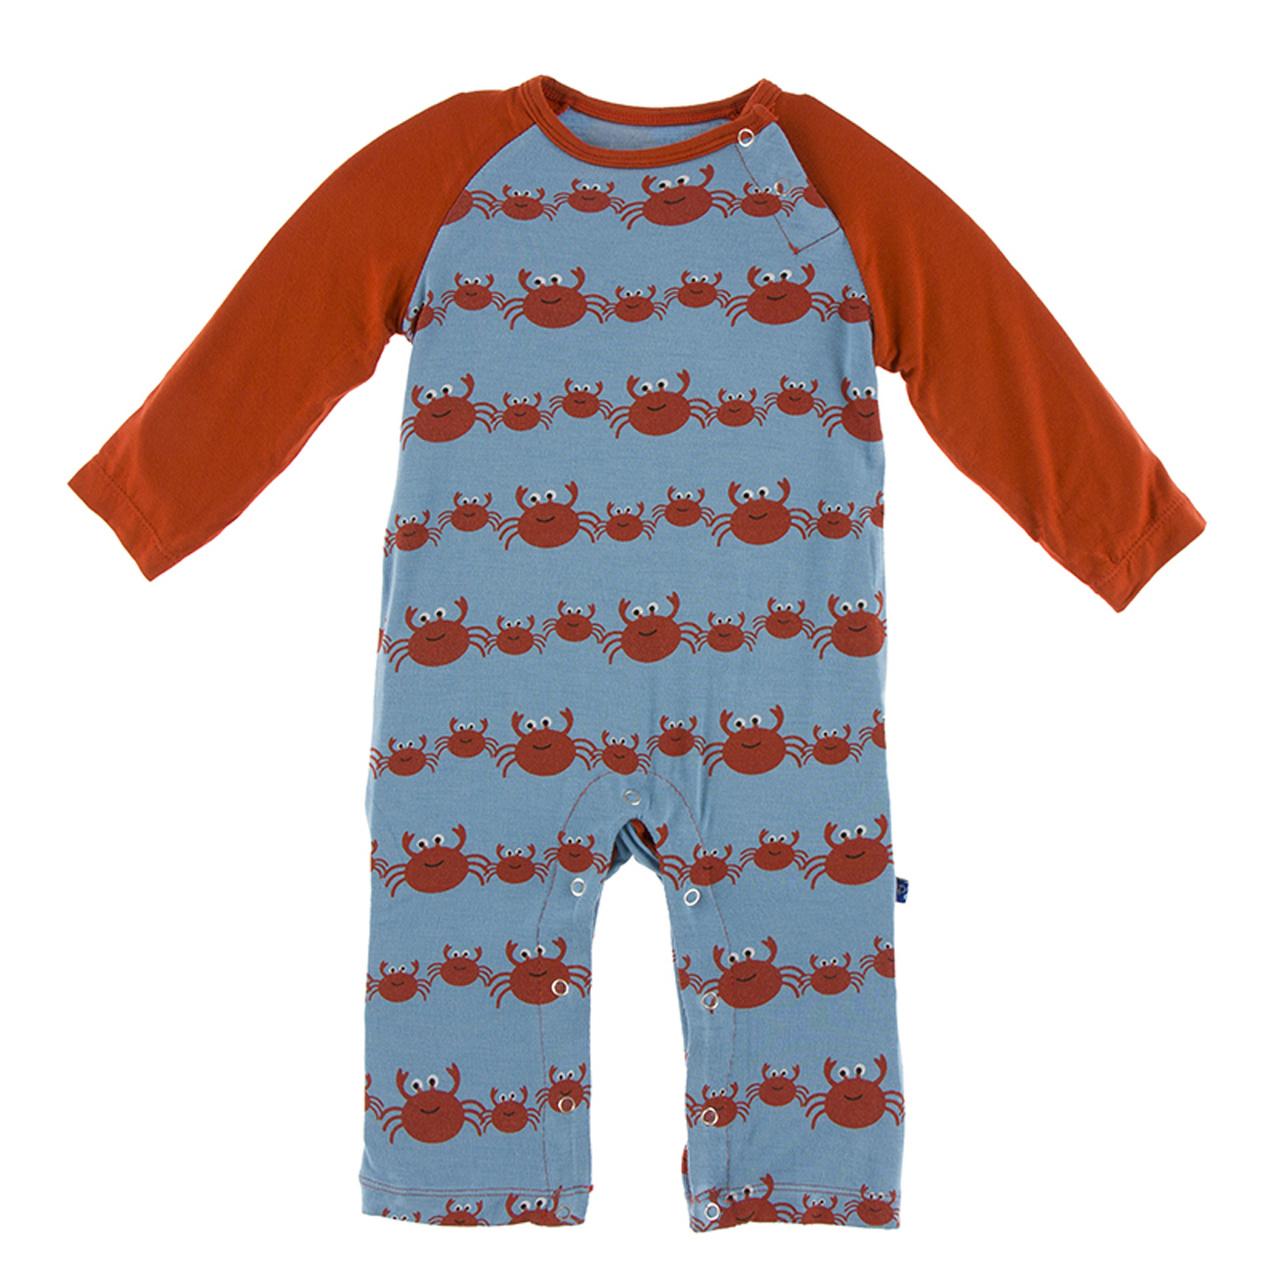 KicKee Pants KicKee Pants Long Sleeve Raglan Romper - Blue Moon Crab Family